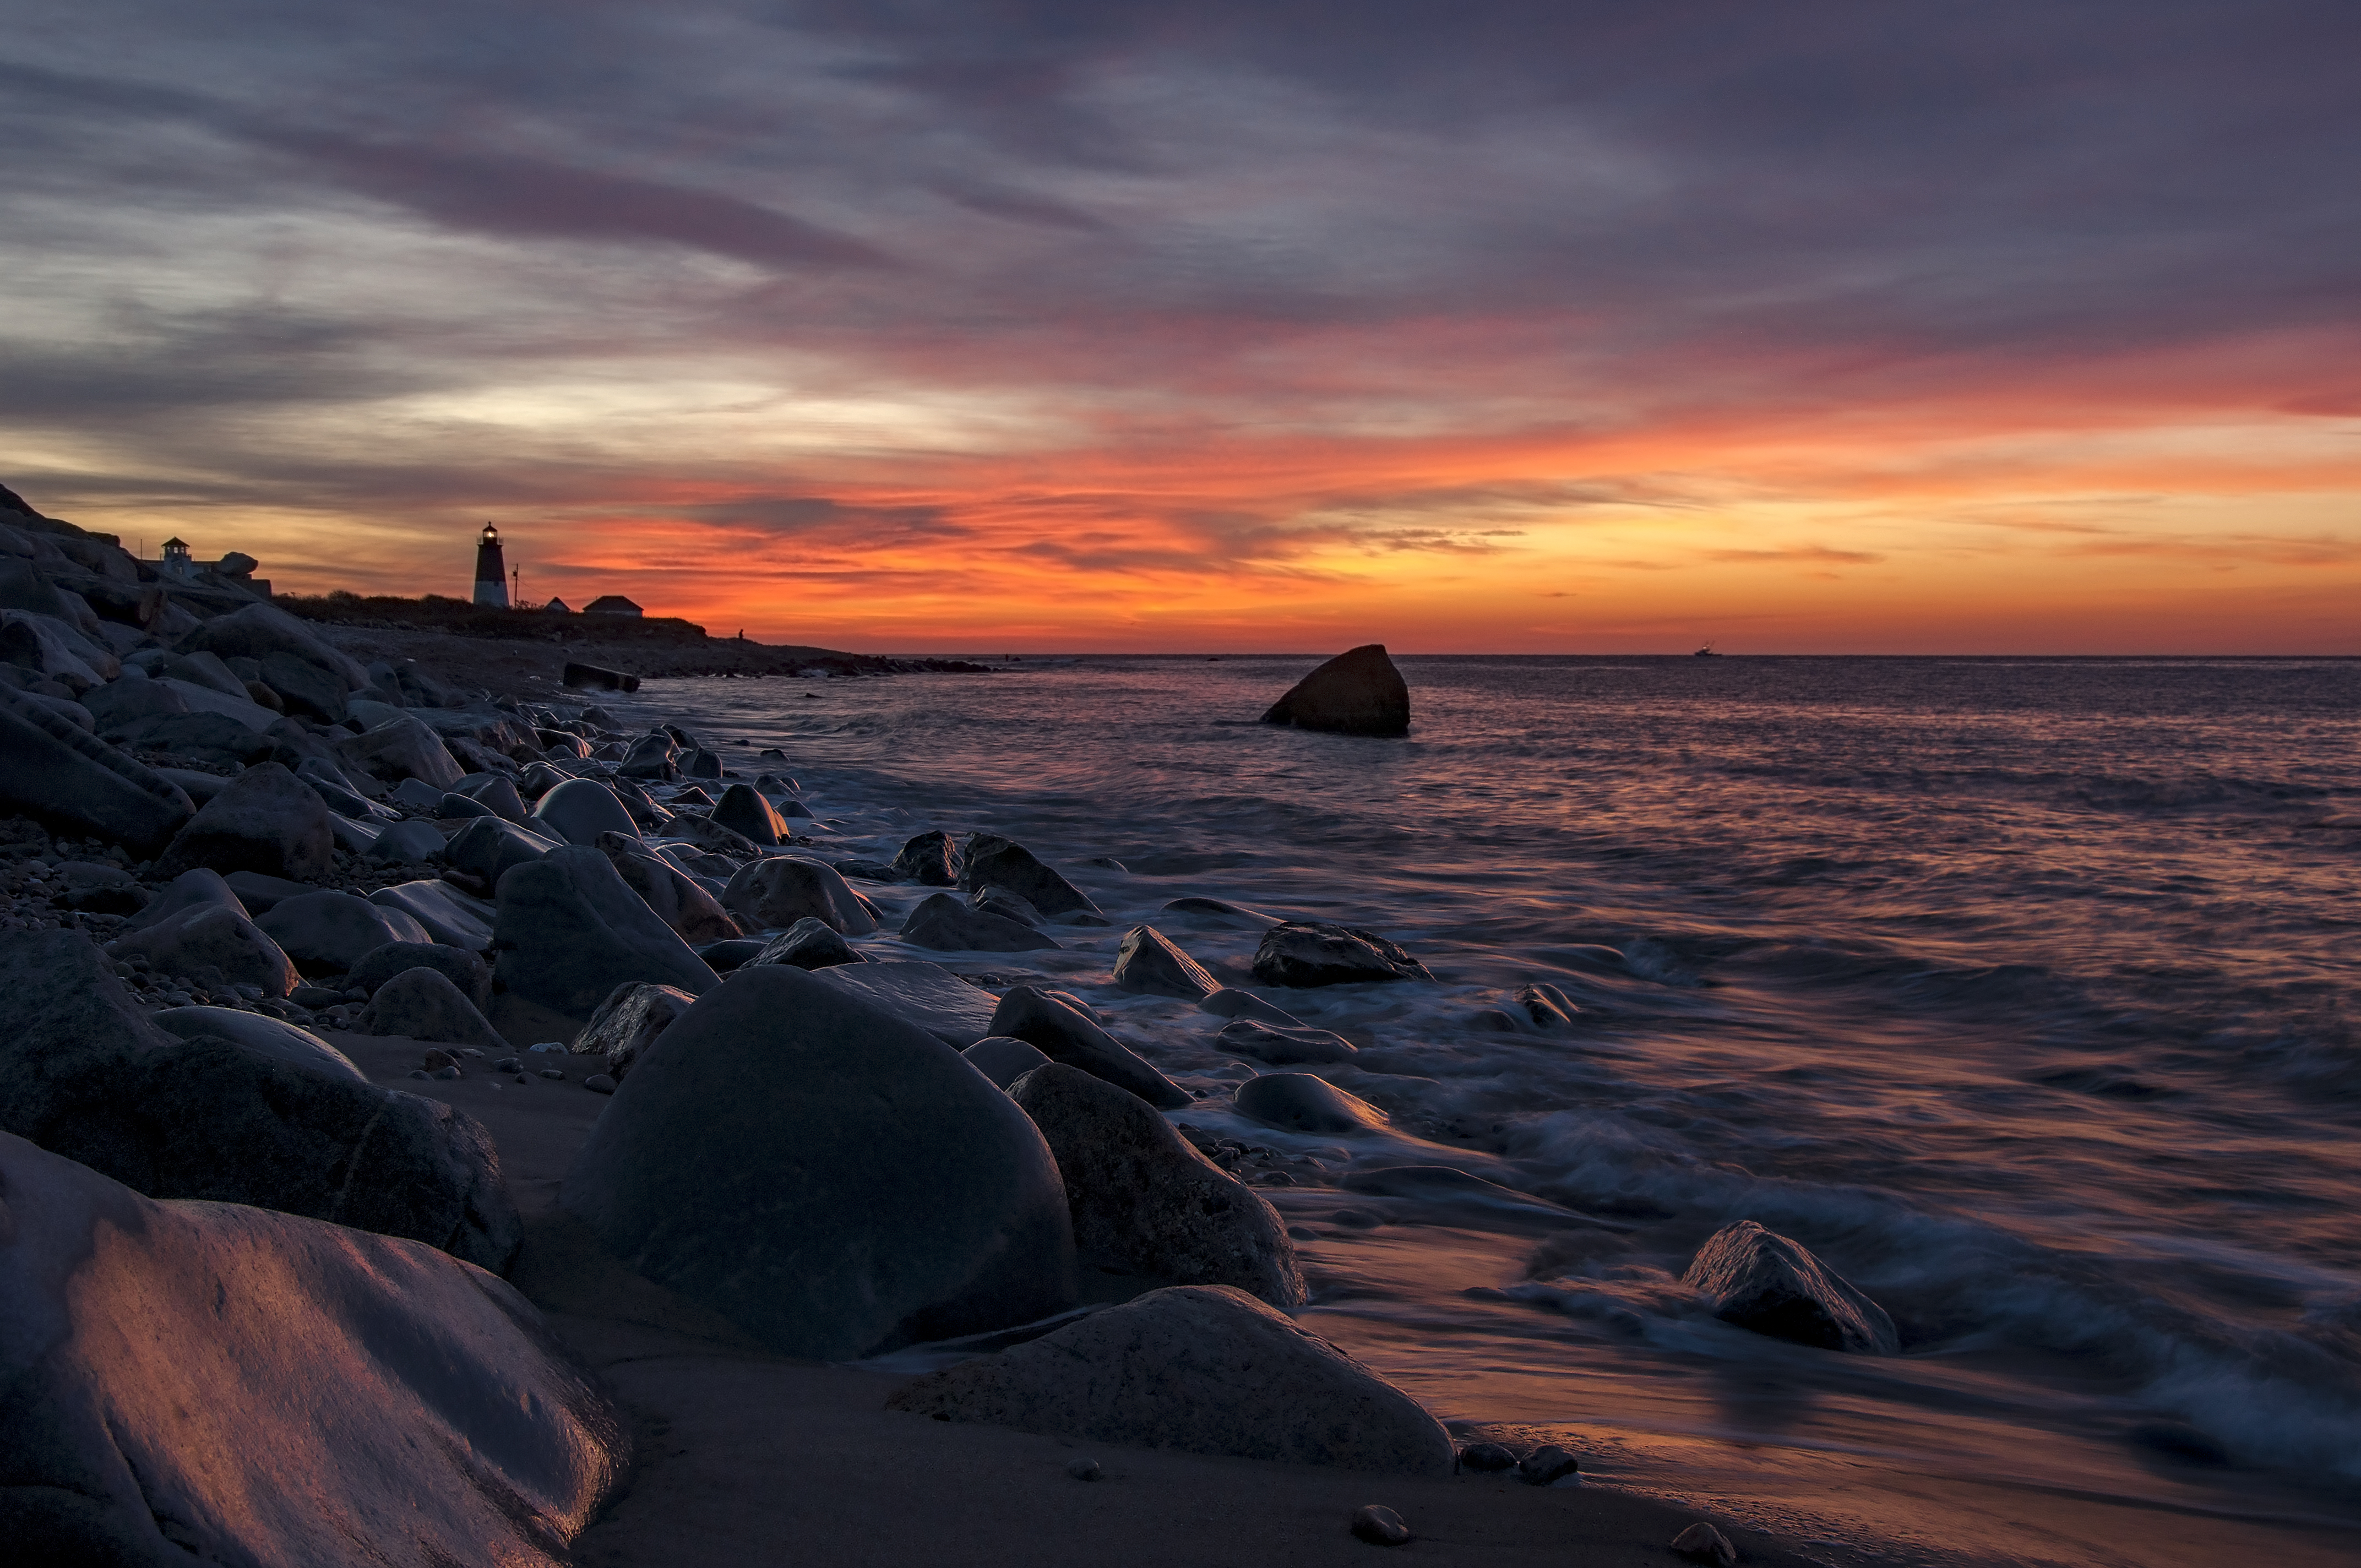 Sunrise-at-Point-Judith-Lighthouse-Narragansett-Rhode-Island.jpg?mtime=20200124121728#asset:107775